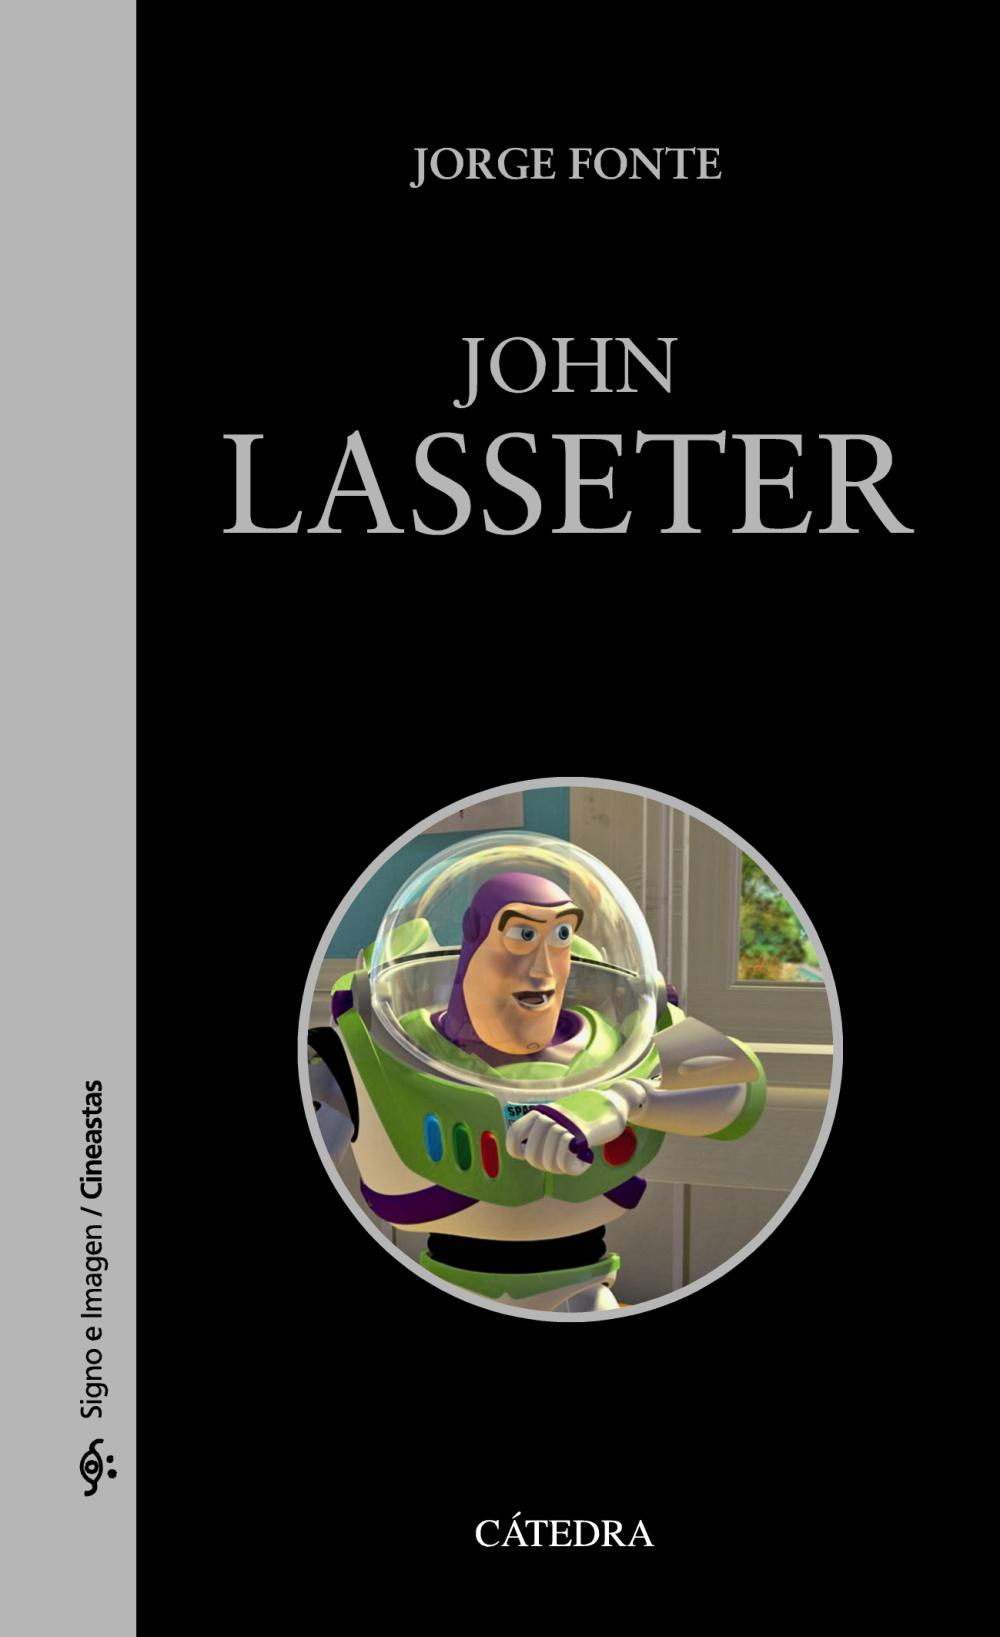 Descargar JOHN LASSETER